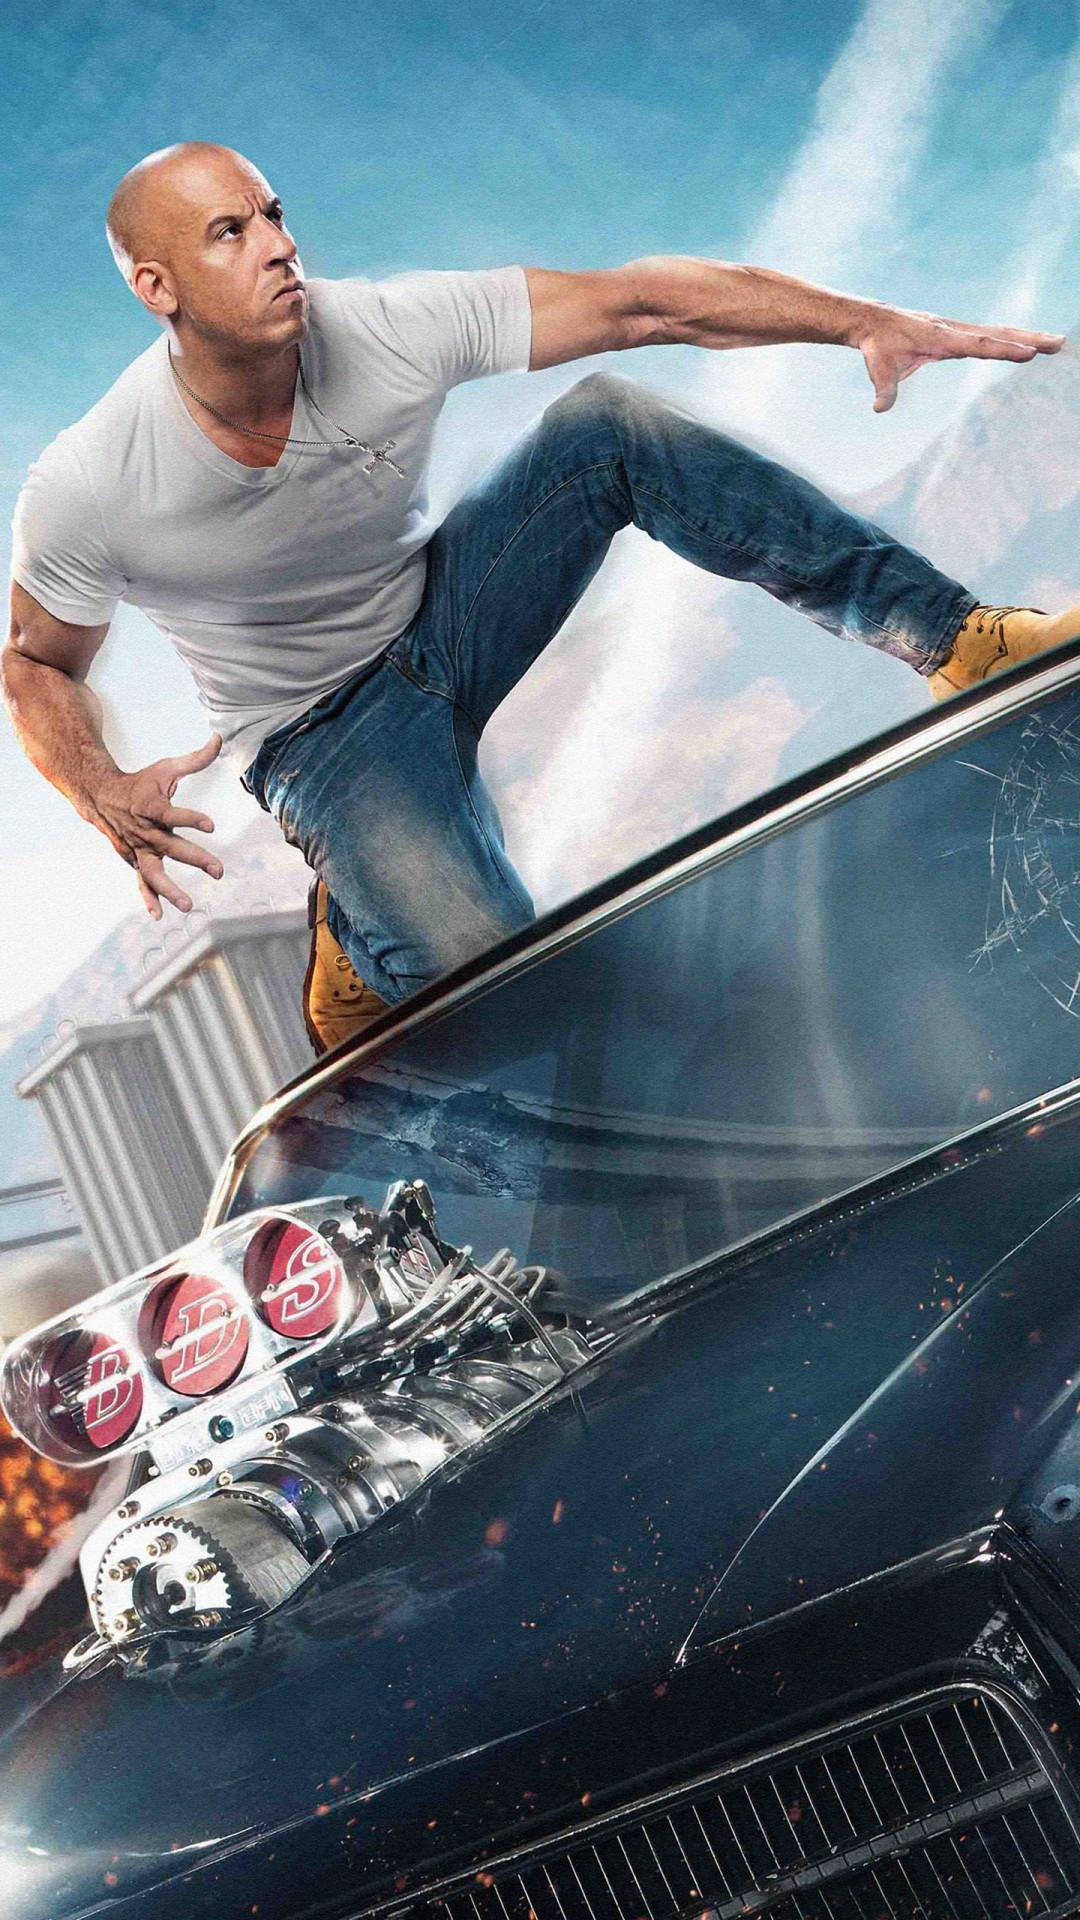 Vin Diesel Fast And Furious 9   1080x1920 Wallpaper   teahubio 1080x1920